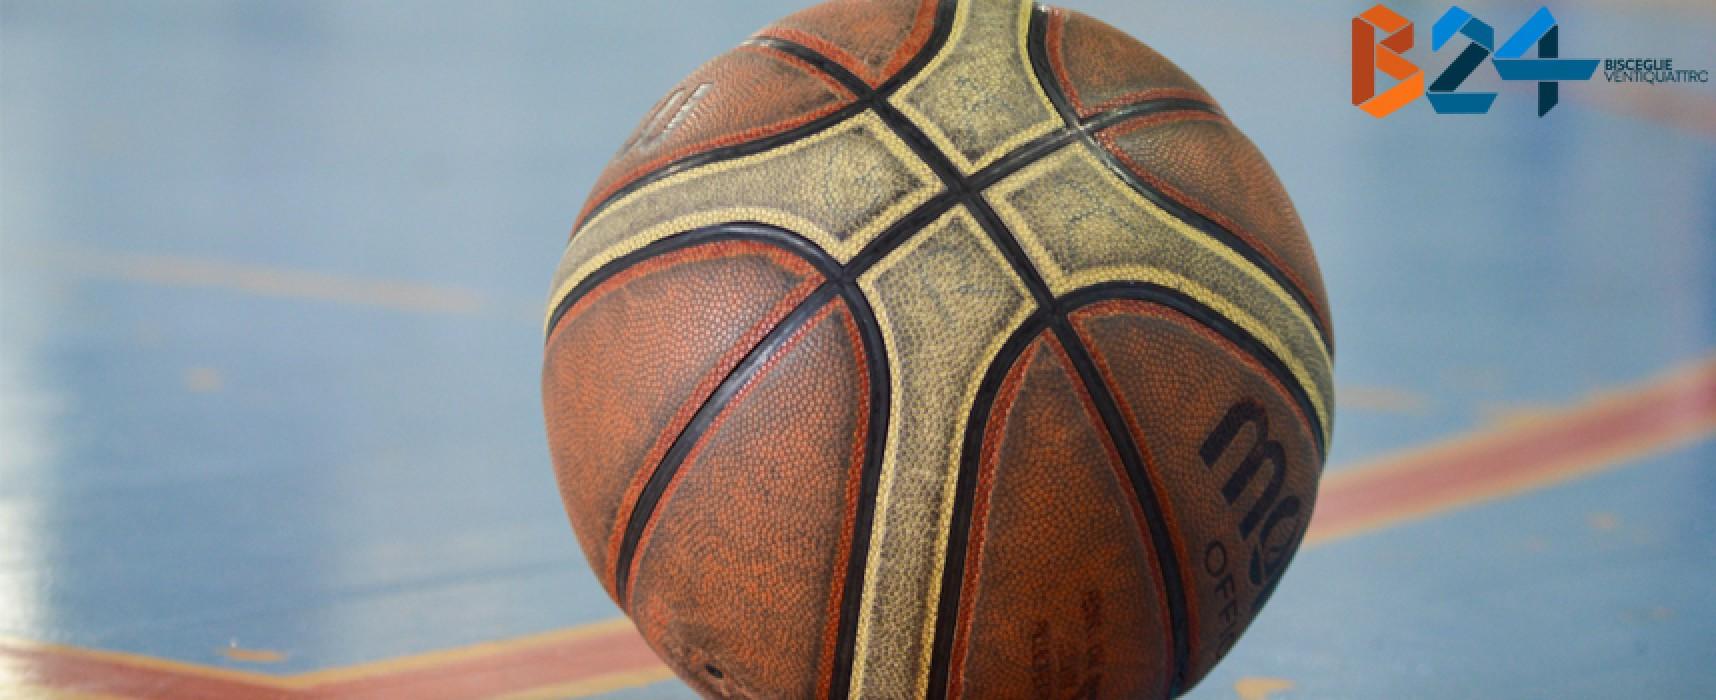 Serie B, definite le avversarie dei Lions Basket Bisceglie